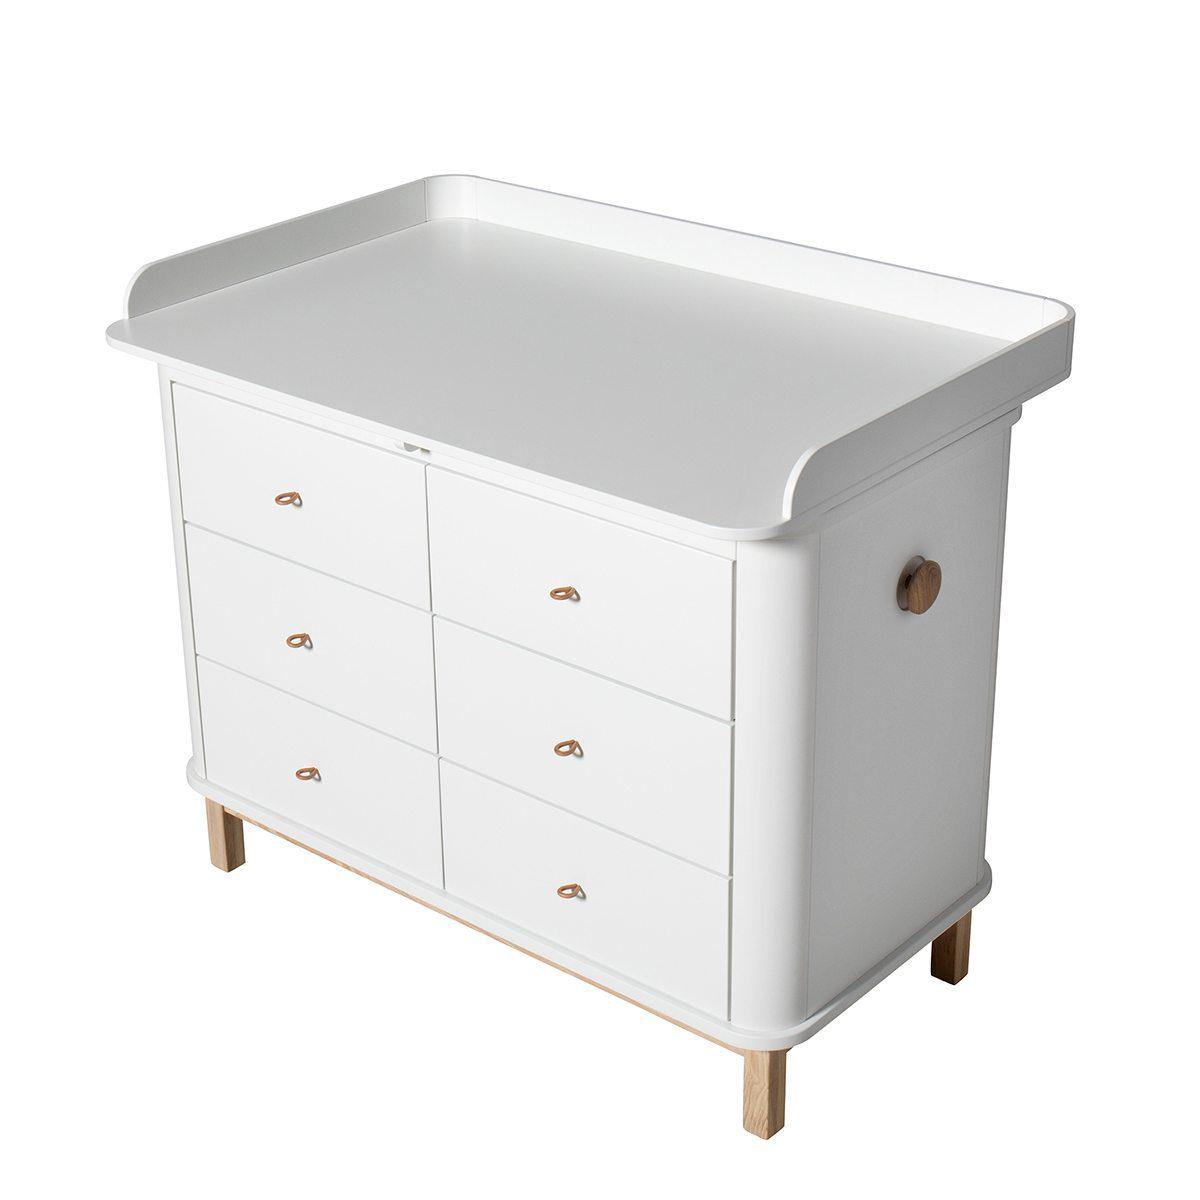 Oliver Furniture Aankleedplank voor commode Wood large